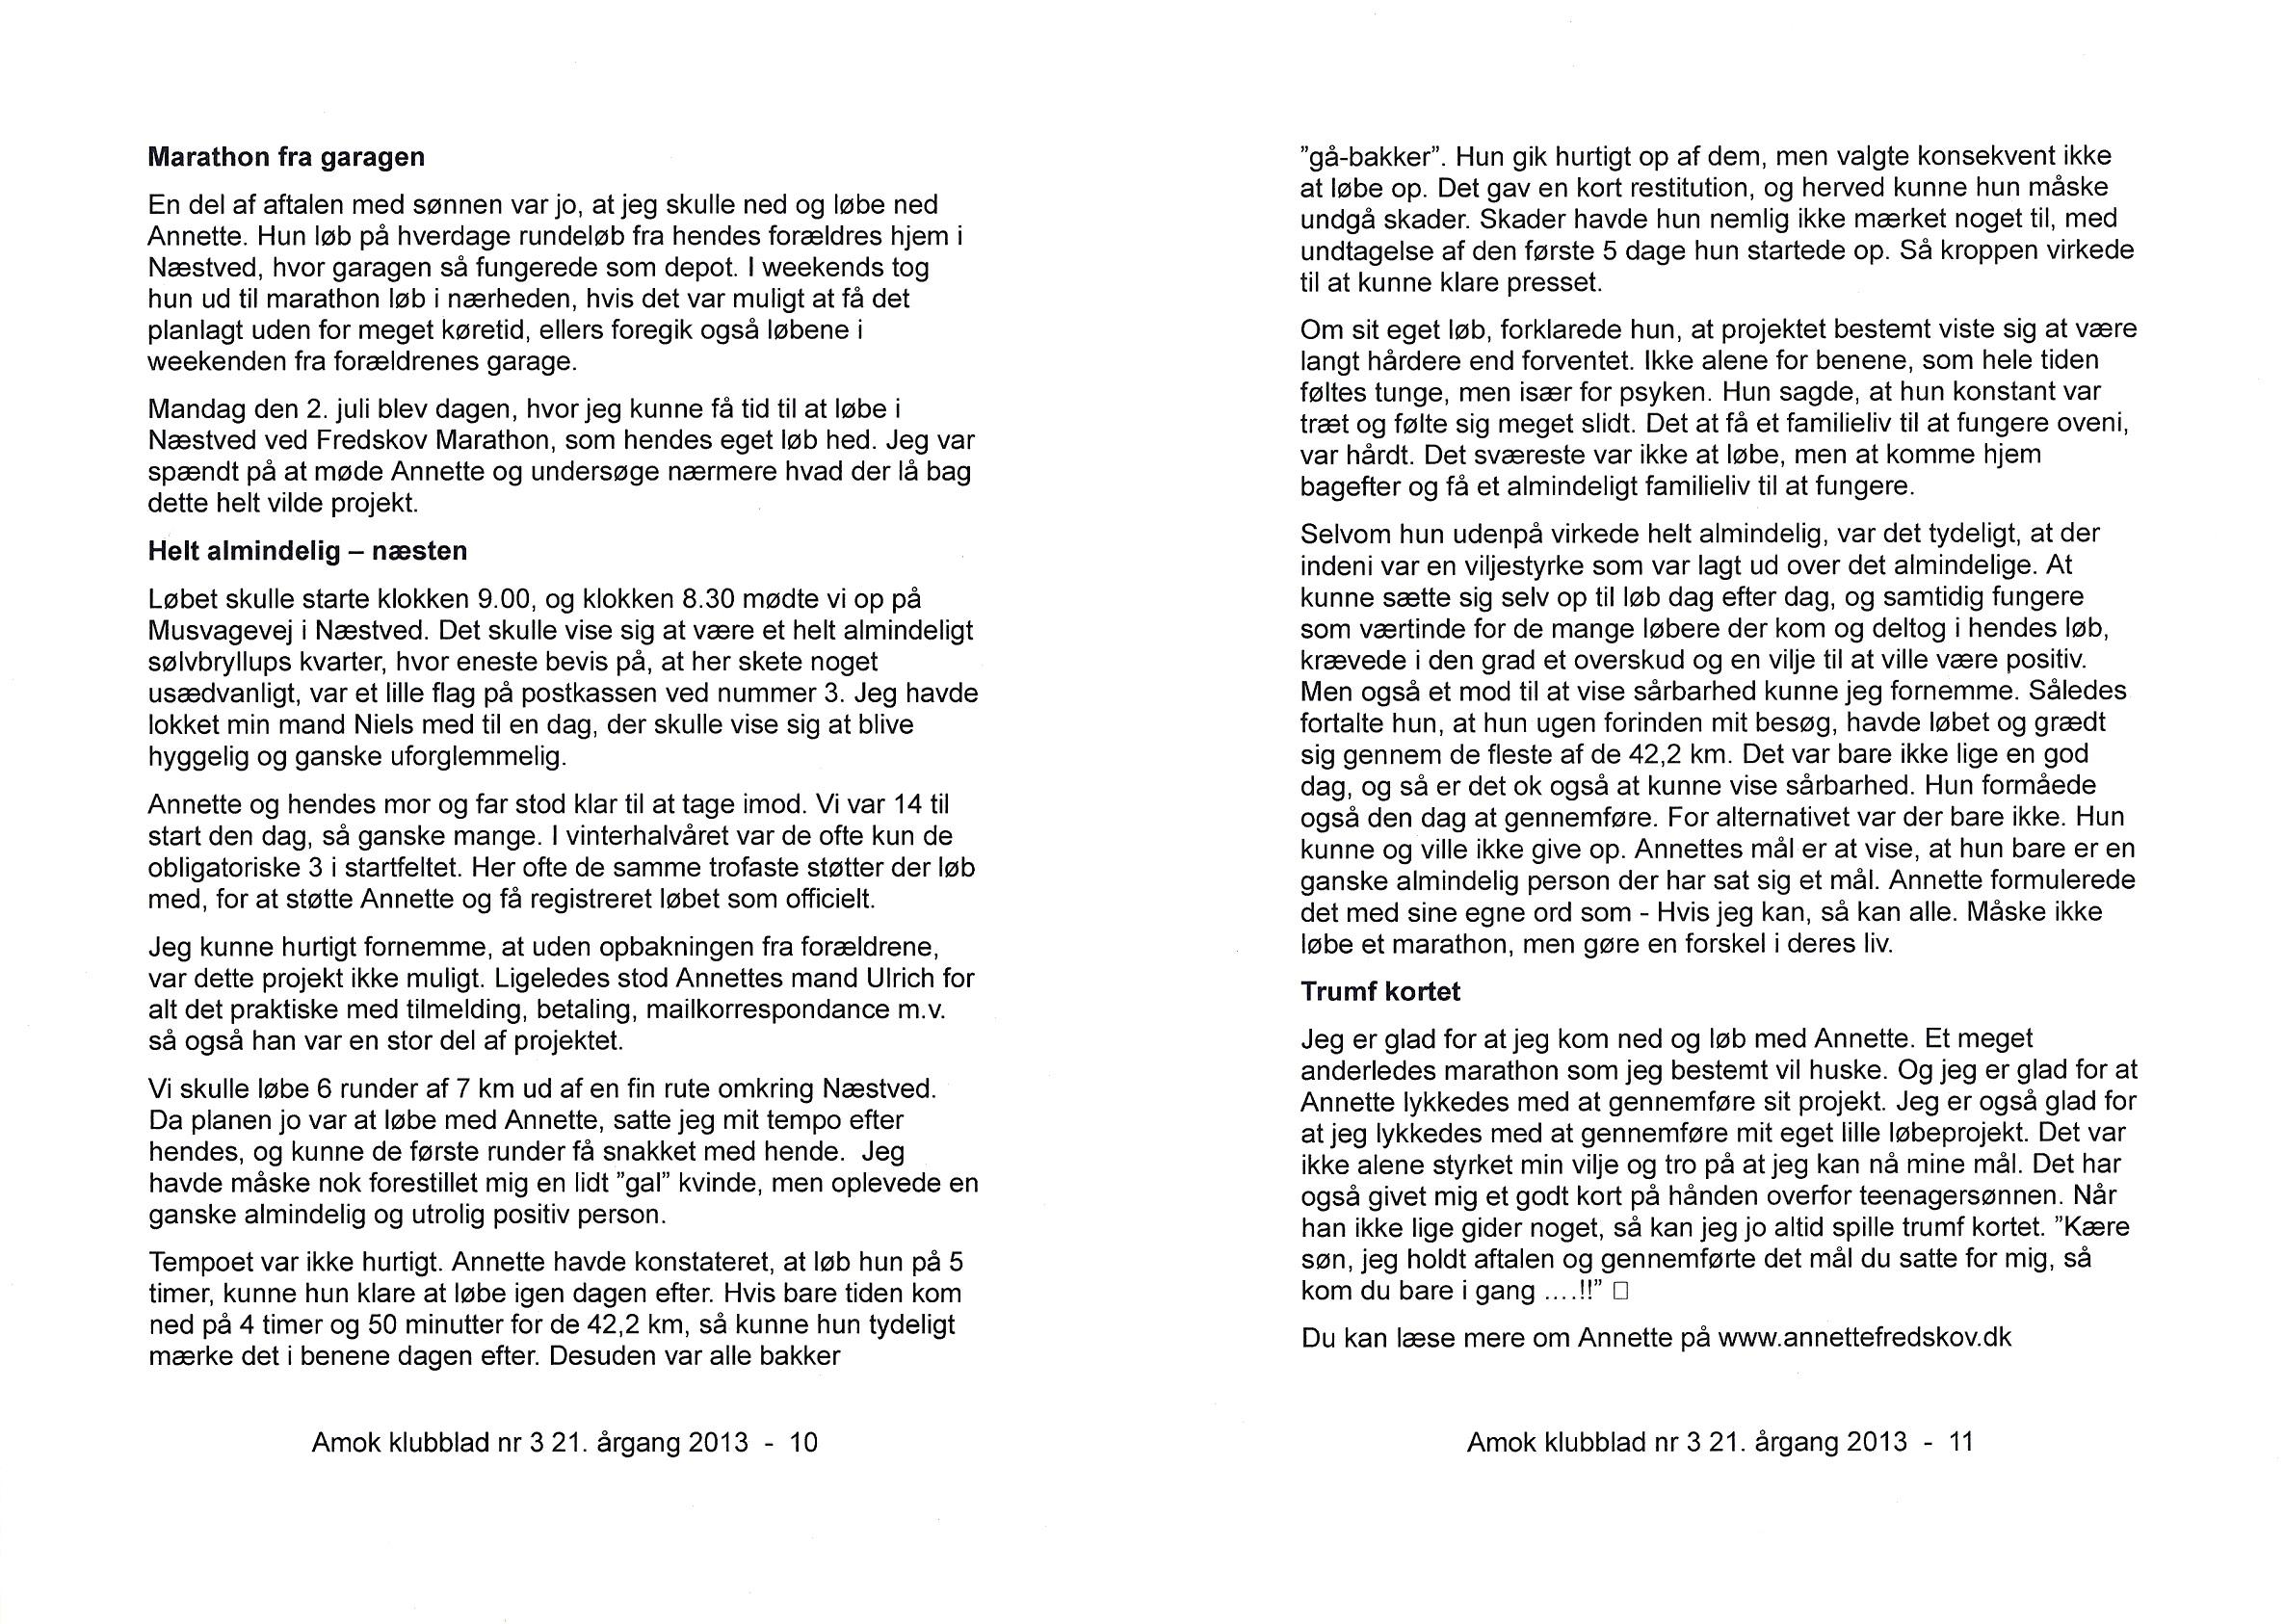 AMOK Medlemsblad 2013.09 #3 - 3